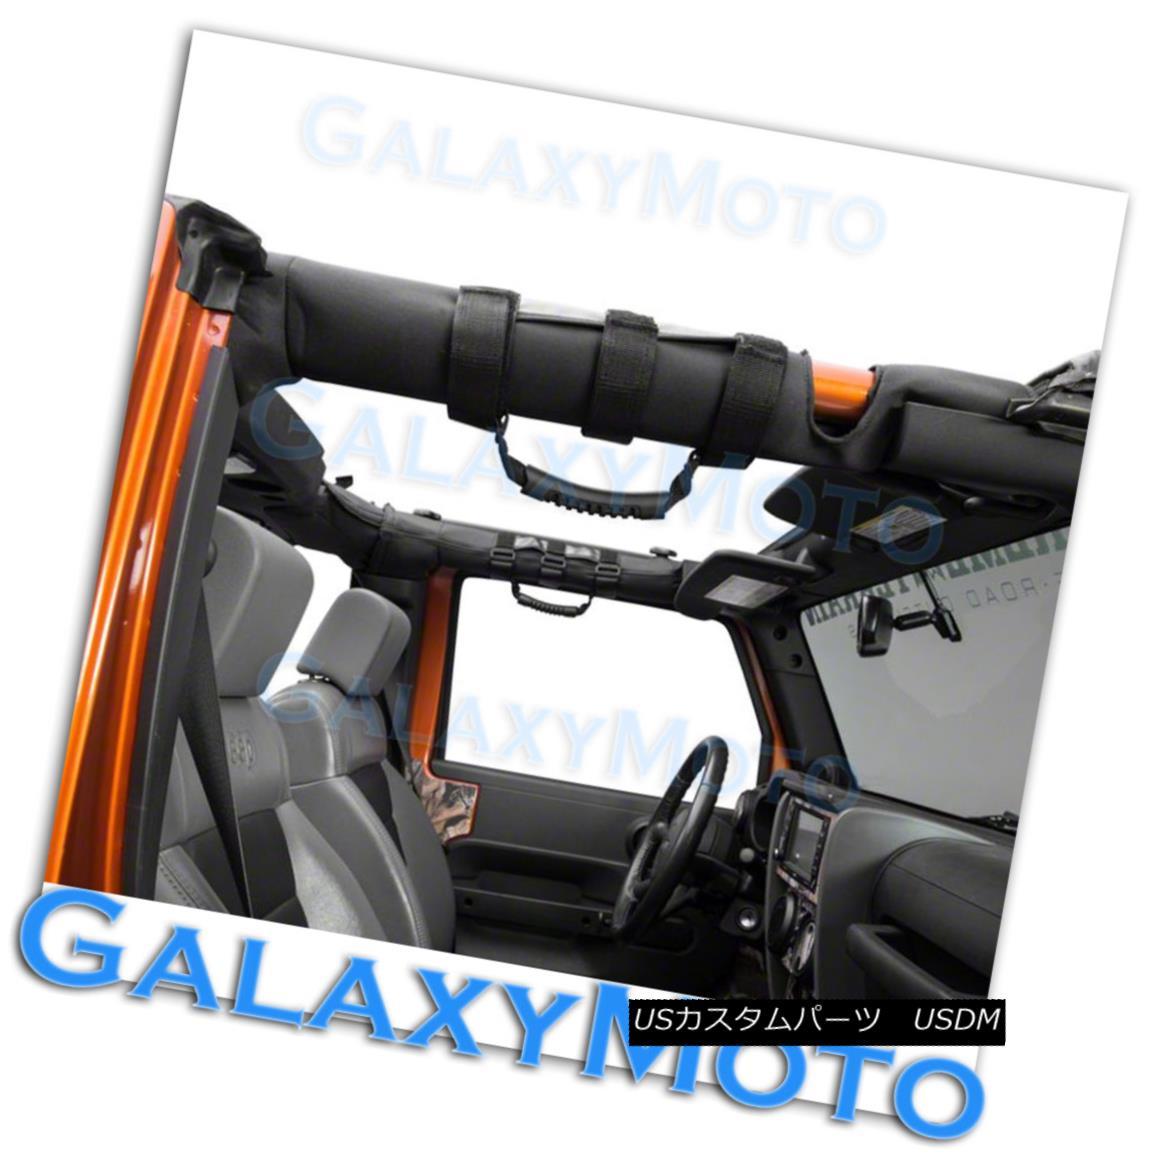 Extreme Sport RED Rear Side Bar Grab Handle 4pcs for 87-16 Jeep Wrangler JK TJ Y